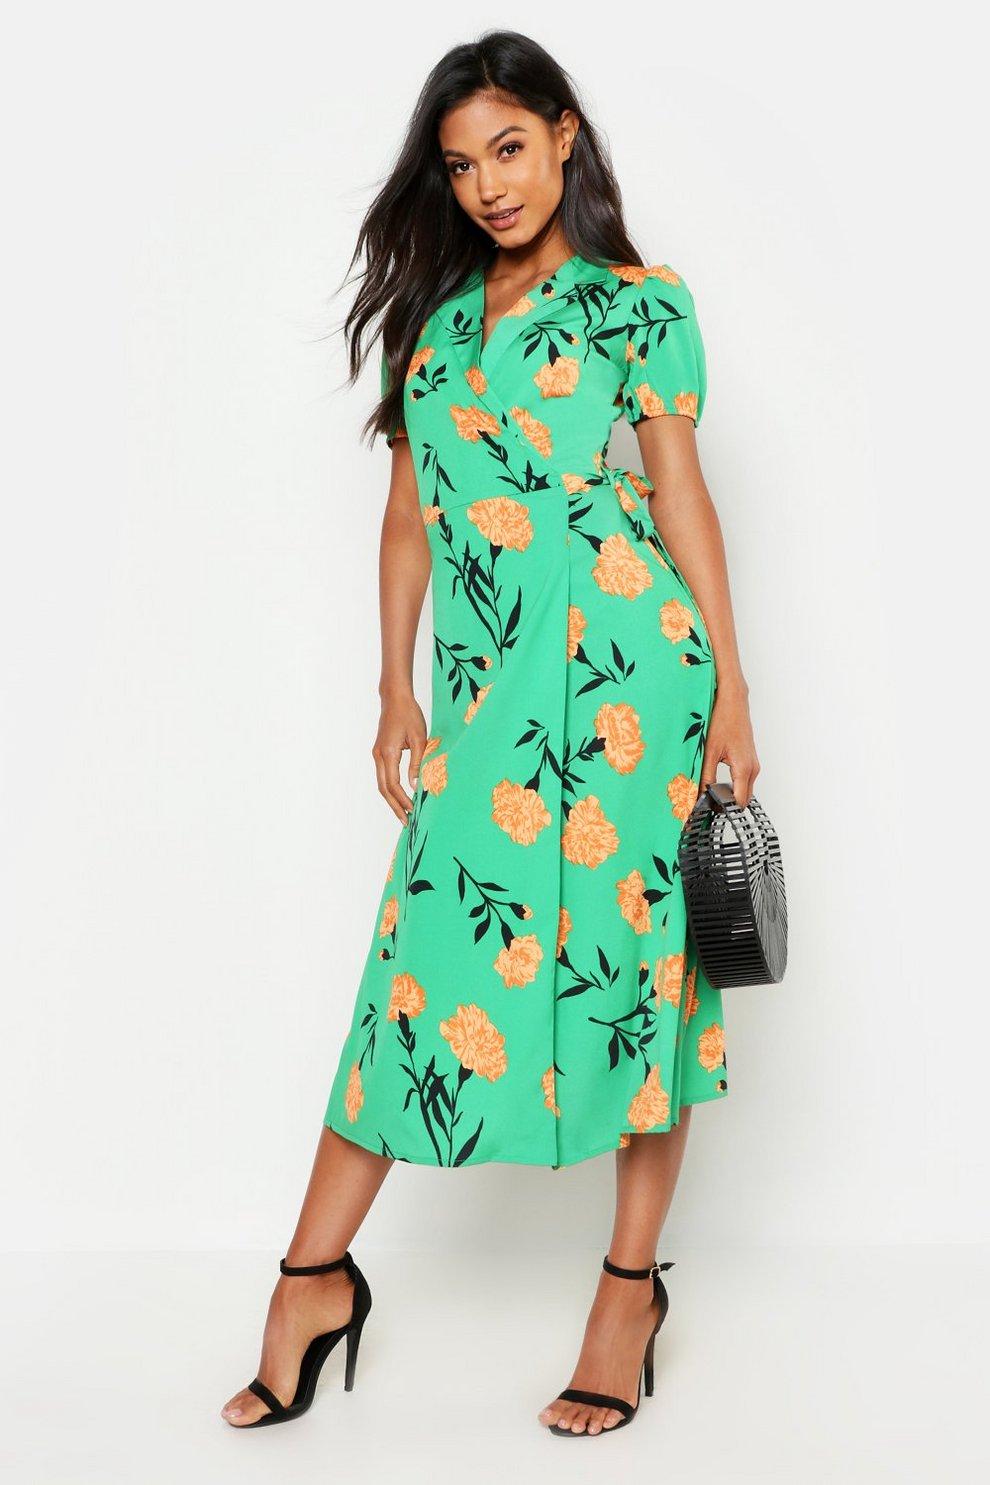 1b206e0c1b Green Floral Print Tie Wrap Midi Skater Dress